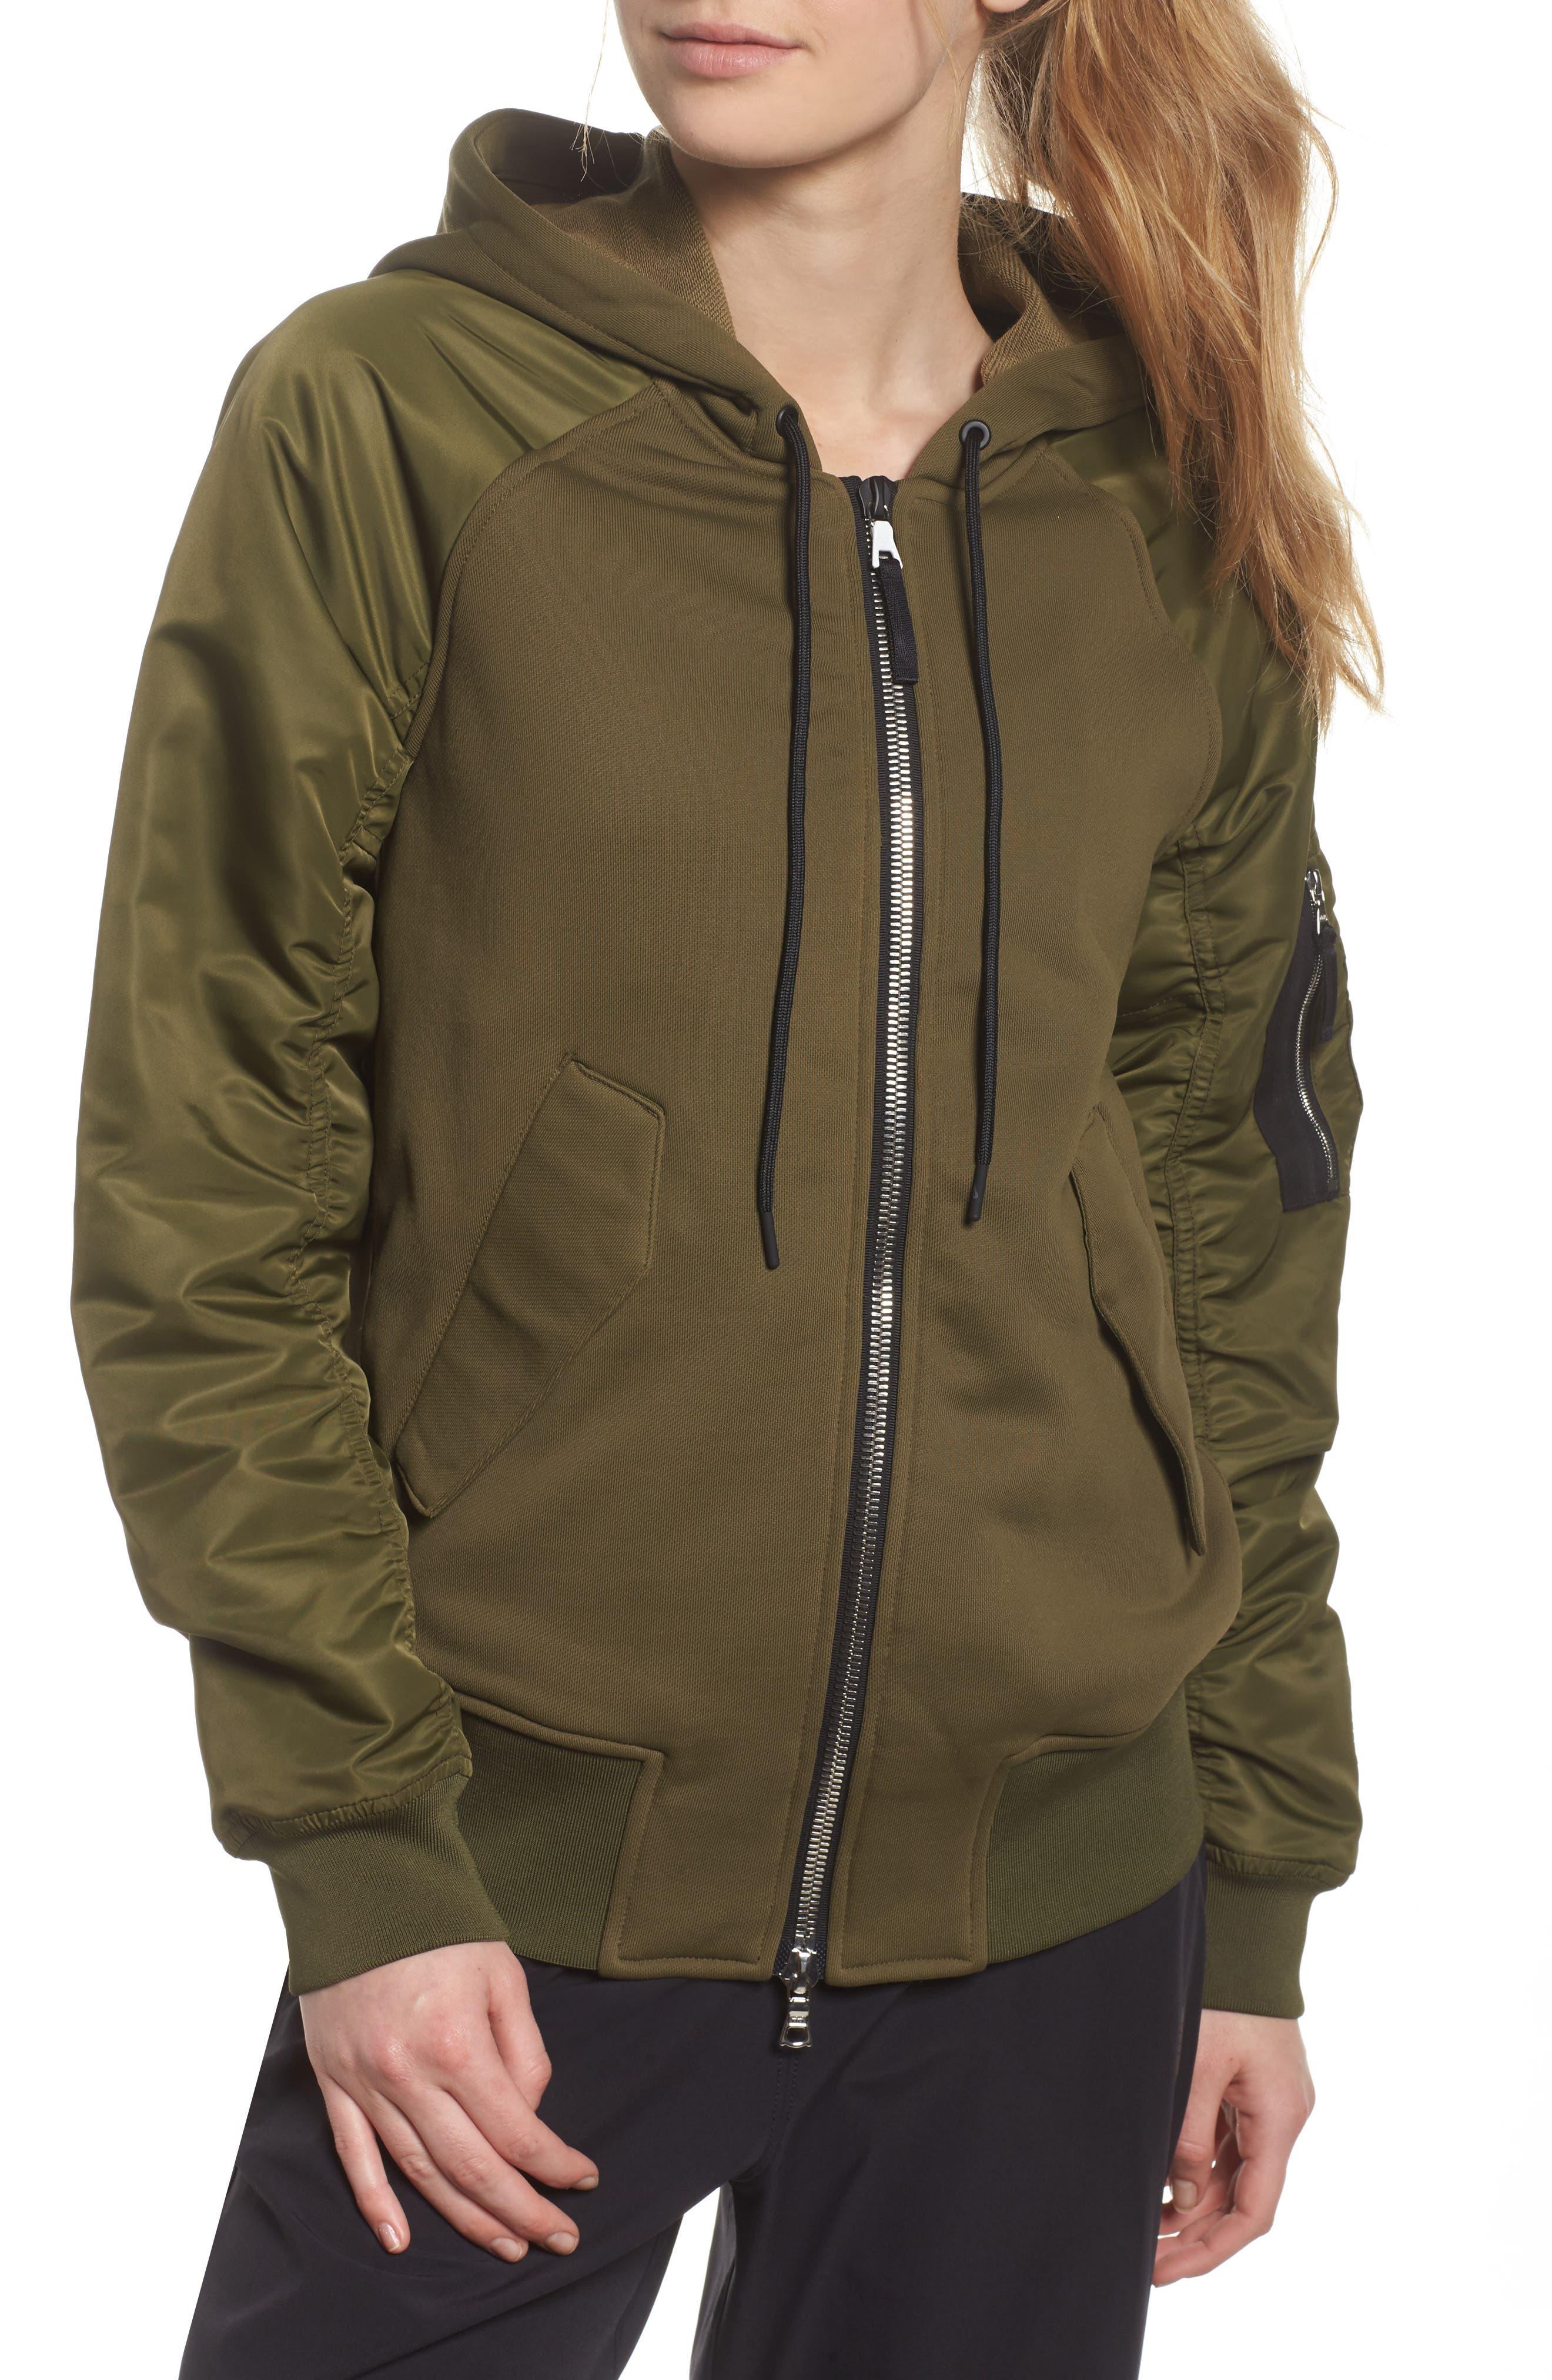 NikeLab Women's Mixed Media Bomber Jacket,                             Alternate thumbnail 7, color,